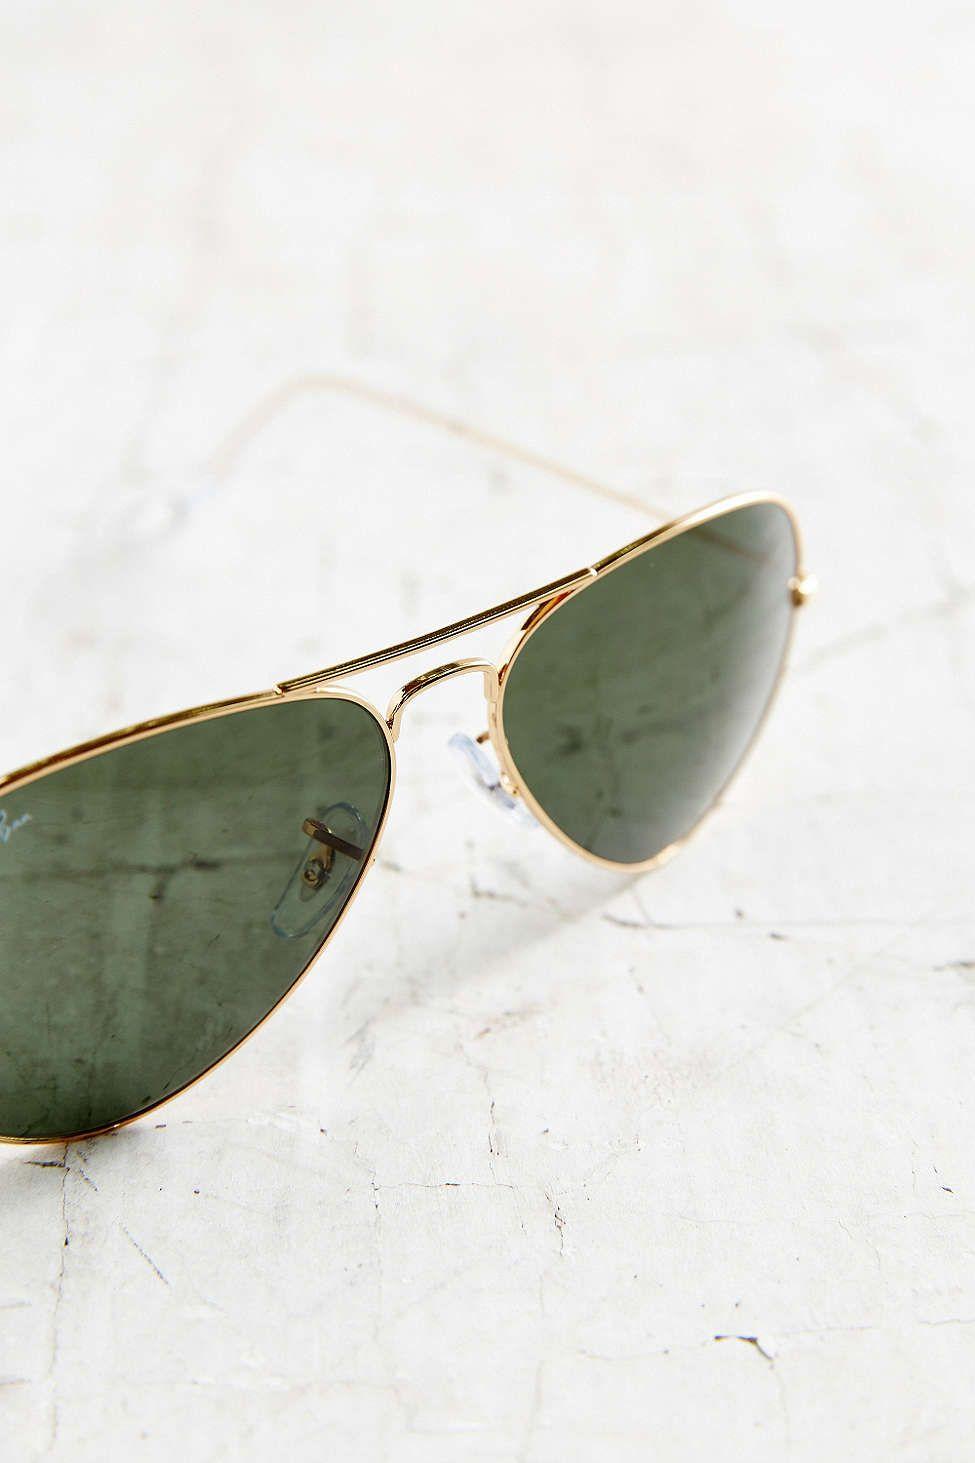 Ray-Ban Original Aviator Sunglasses   MATERIALISM  3   Pinterest 3b93726c18